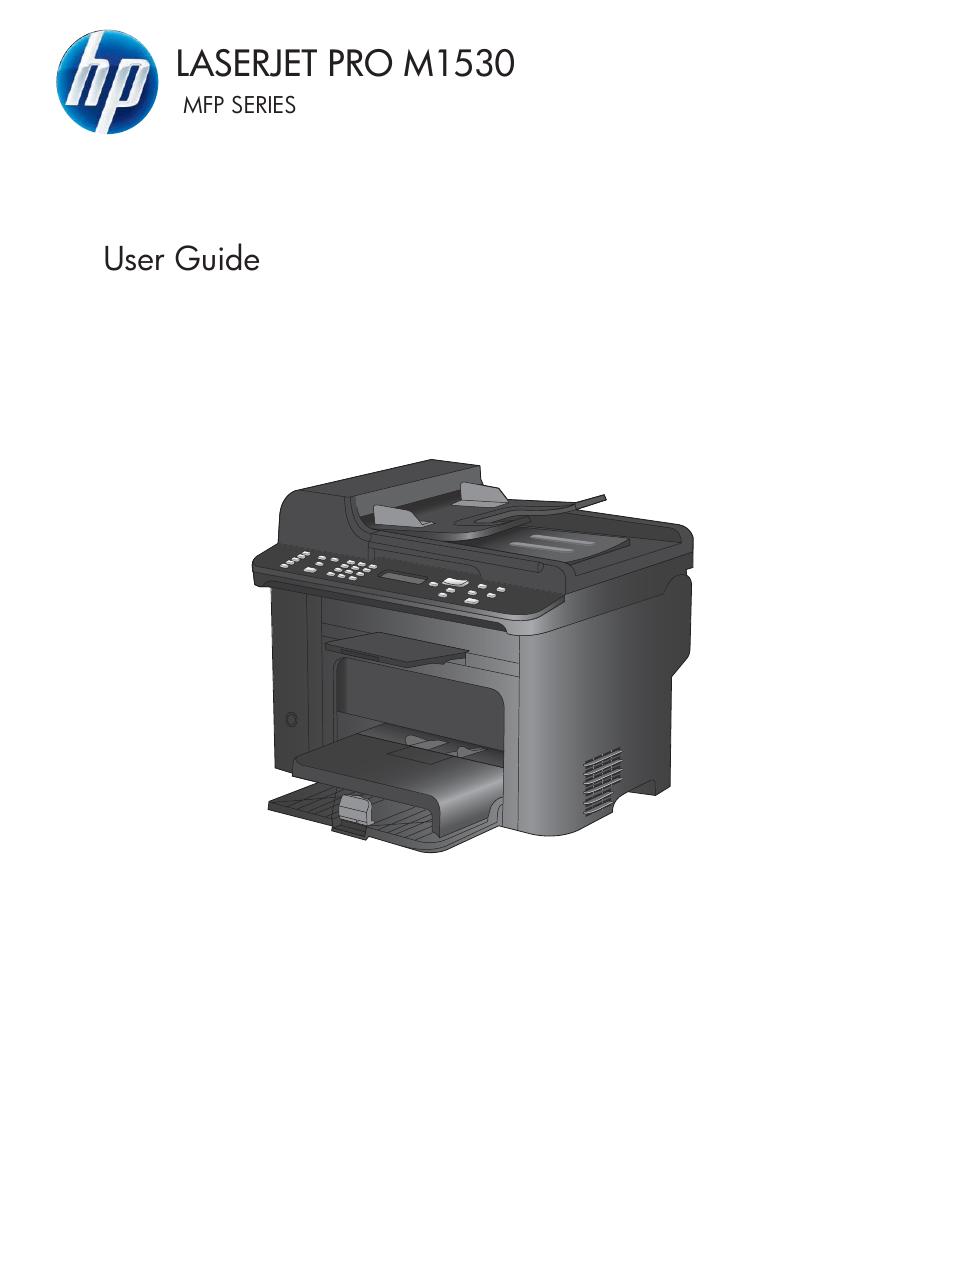 hp laserjet pro m1536dnf mfp series user manual 286 pages also rh manualsdir com HP D1530 Printer Driver HP D1530 Printer Driver